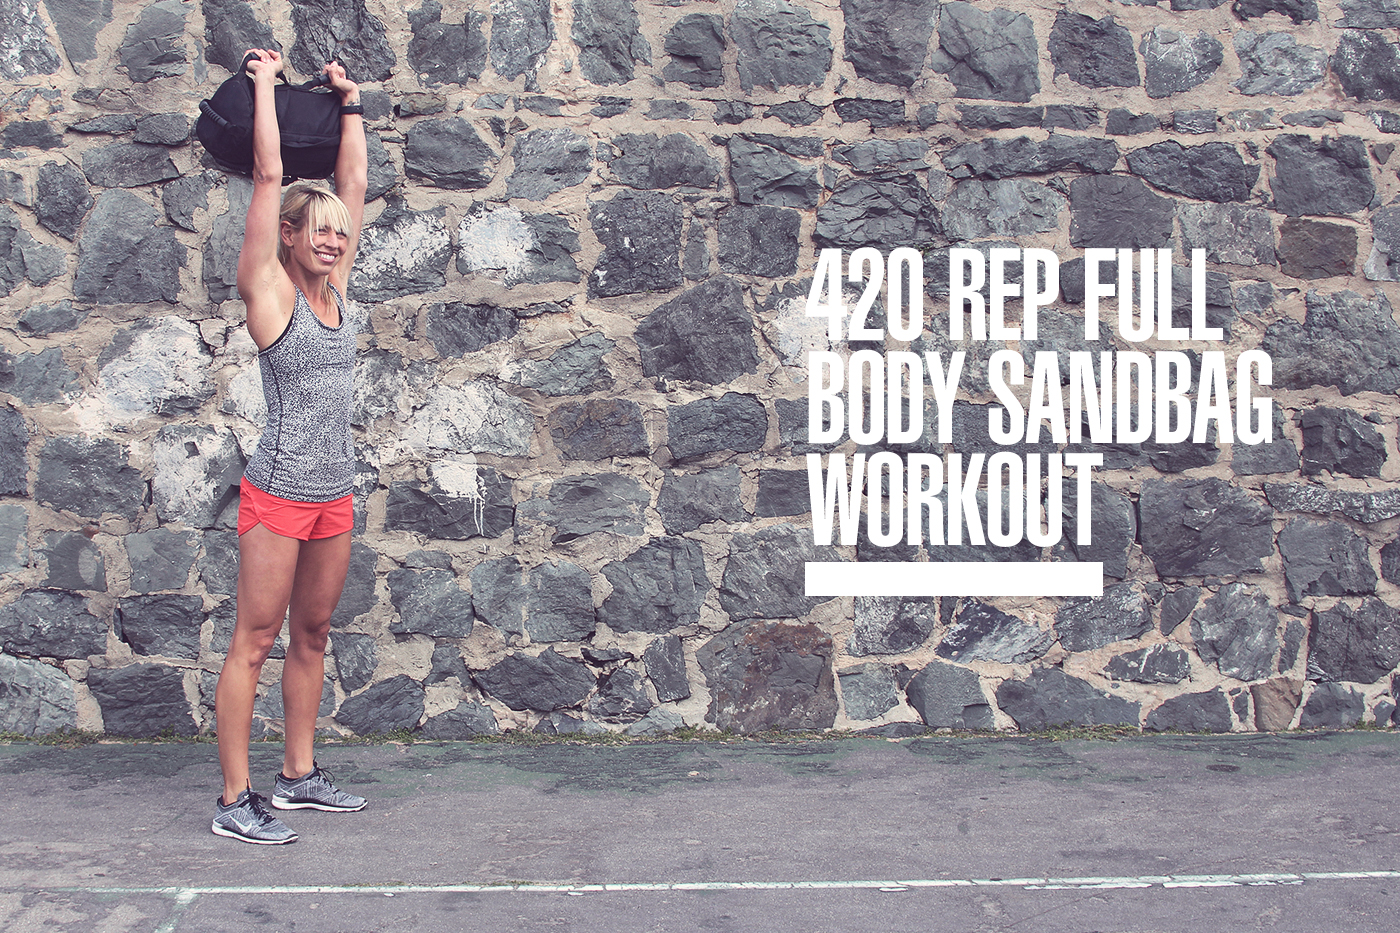 420 Rep Full Body Sandbag Workout